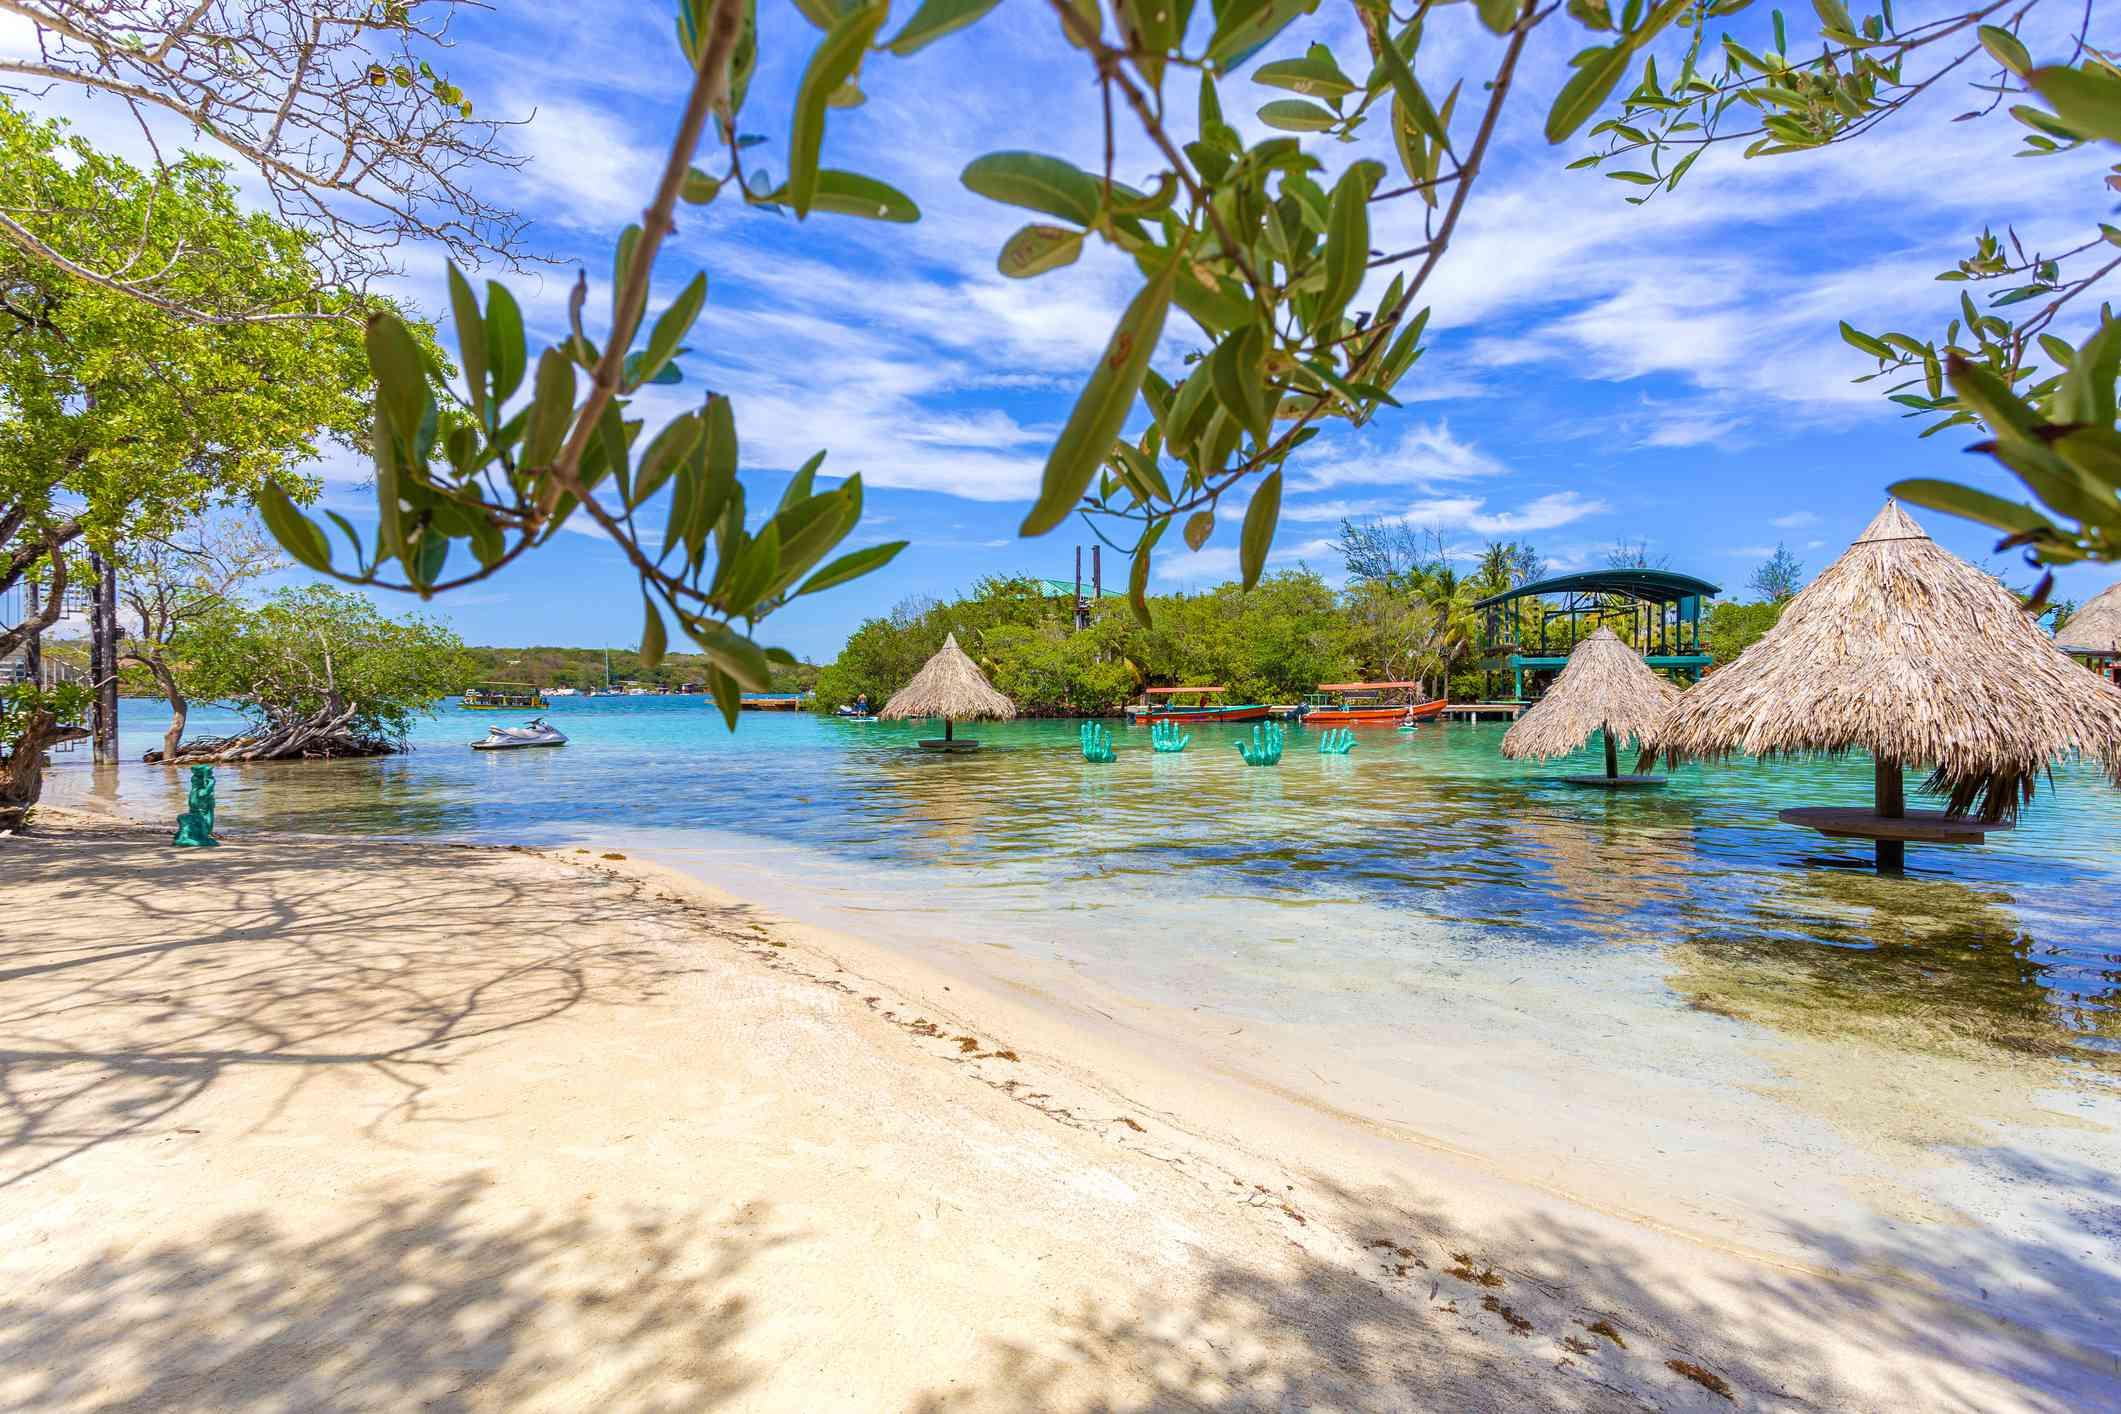 Idyllic transparent water beach in the caribbean sea in a sunny day, Roatan.